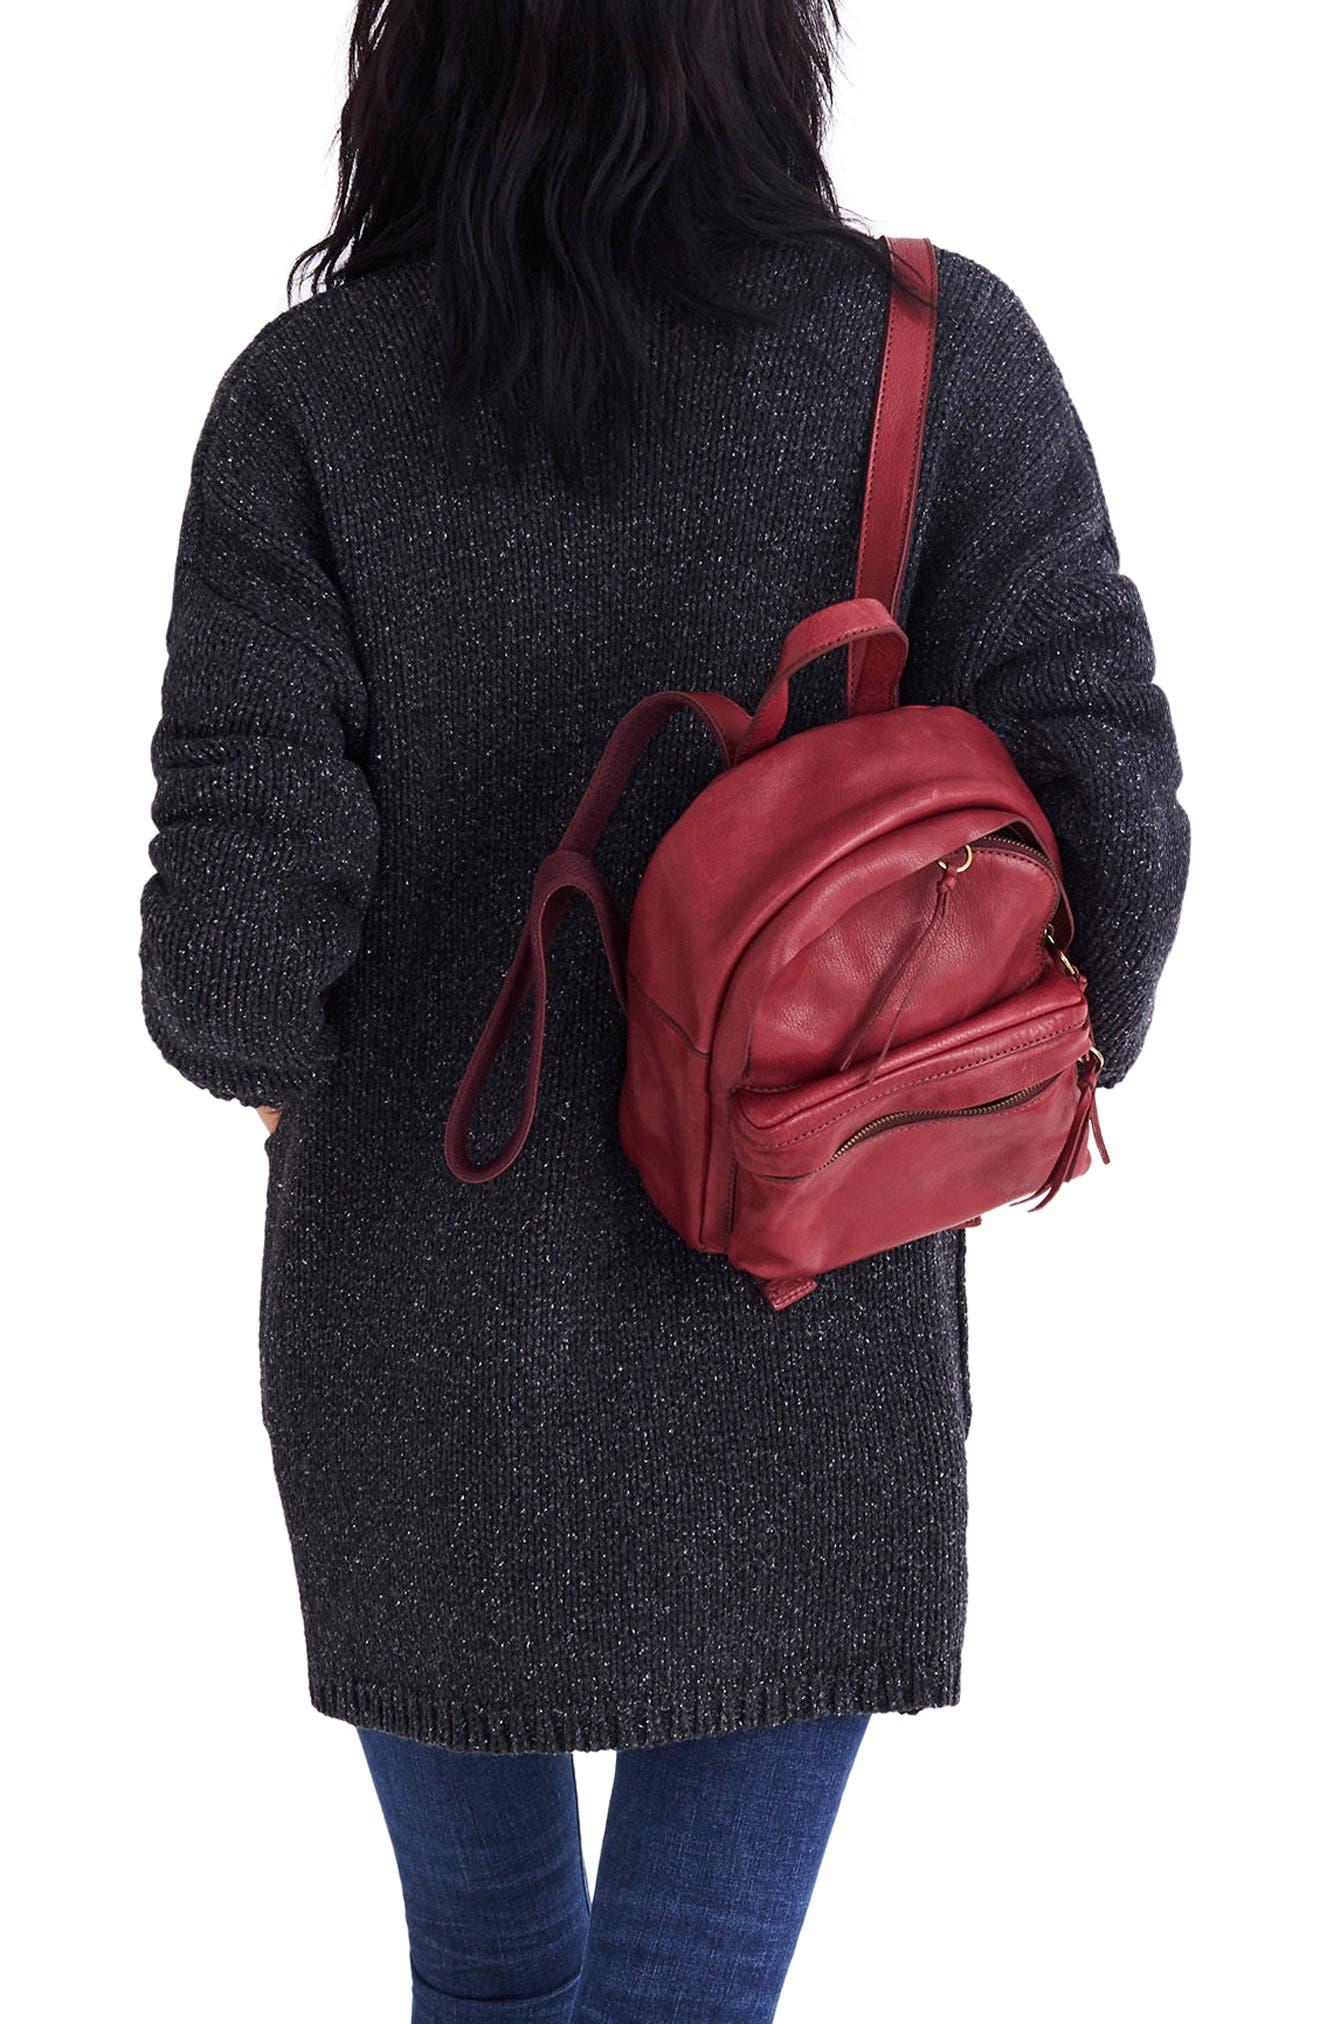 Glenhill Sweater Coat,                             Alternate thumbnail 2, color,                             Ashland Slate